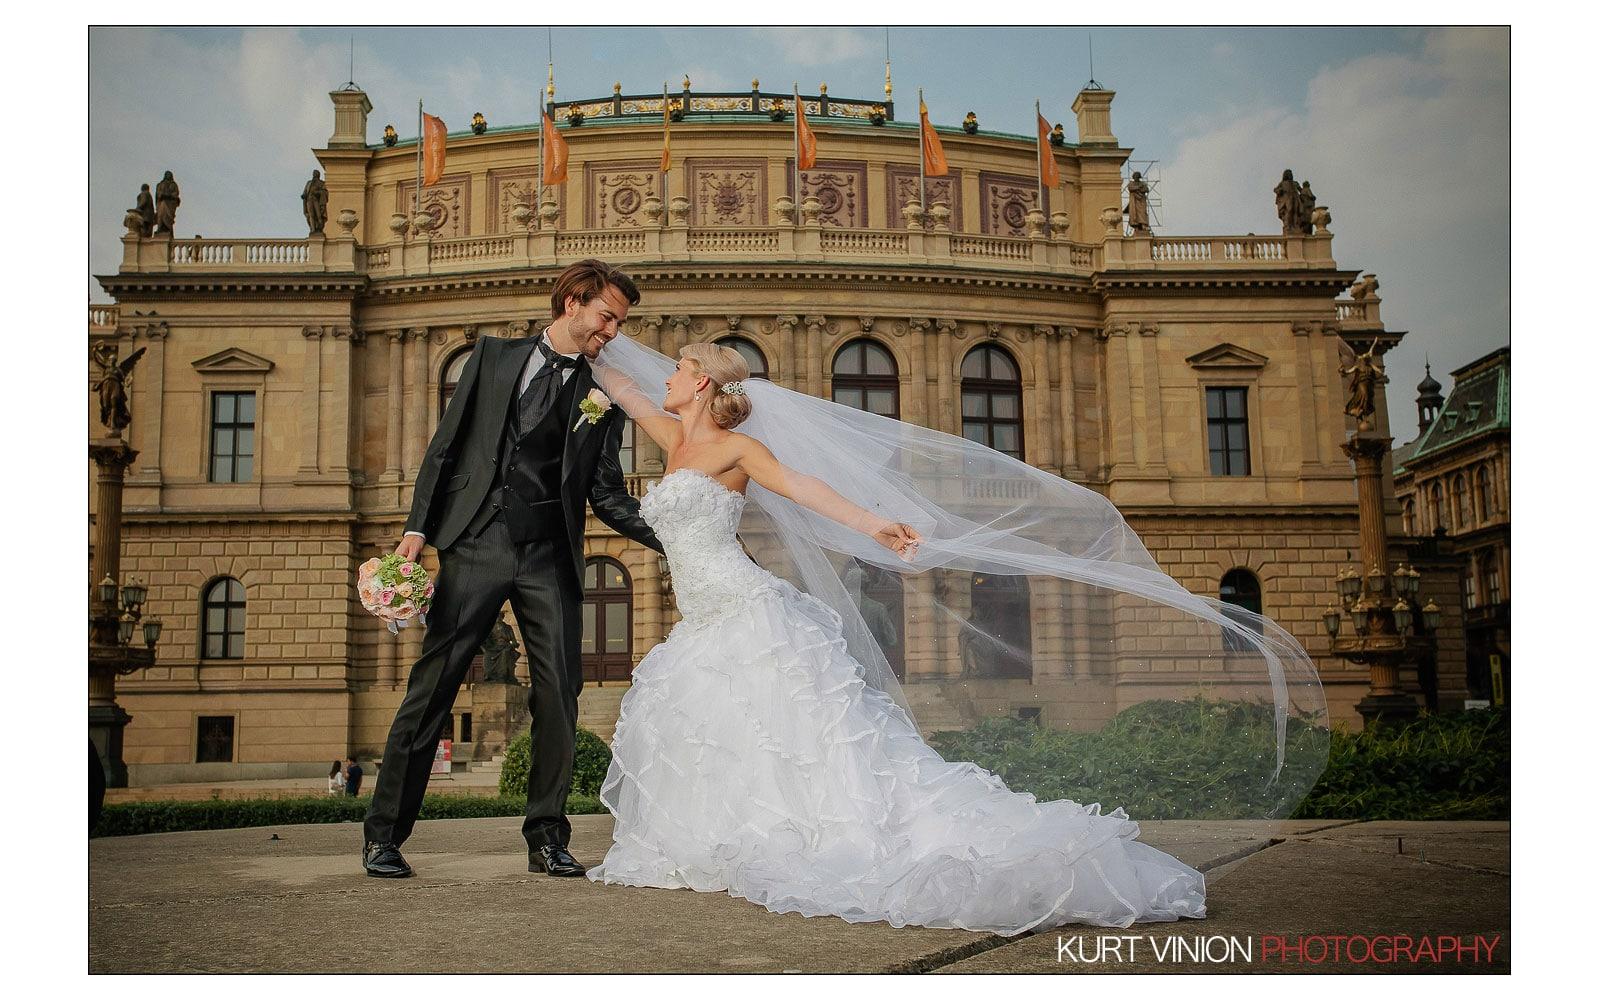 Prague Clementinum wedding / Jess + James - wedding portraits at the Rudolfinum